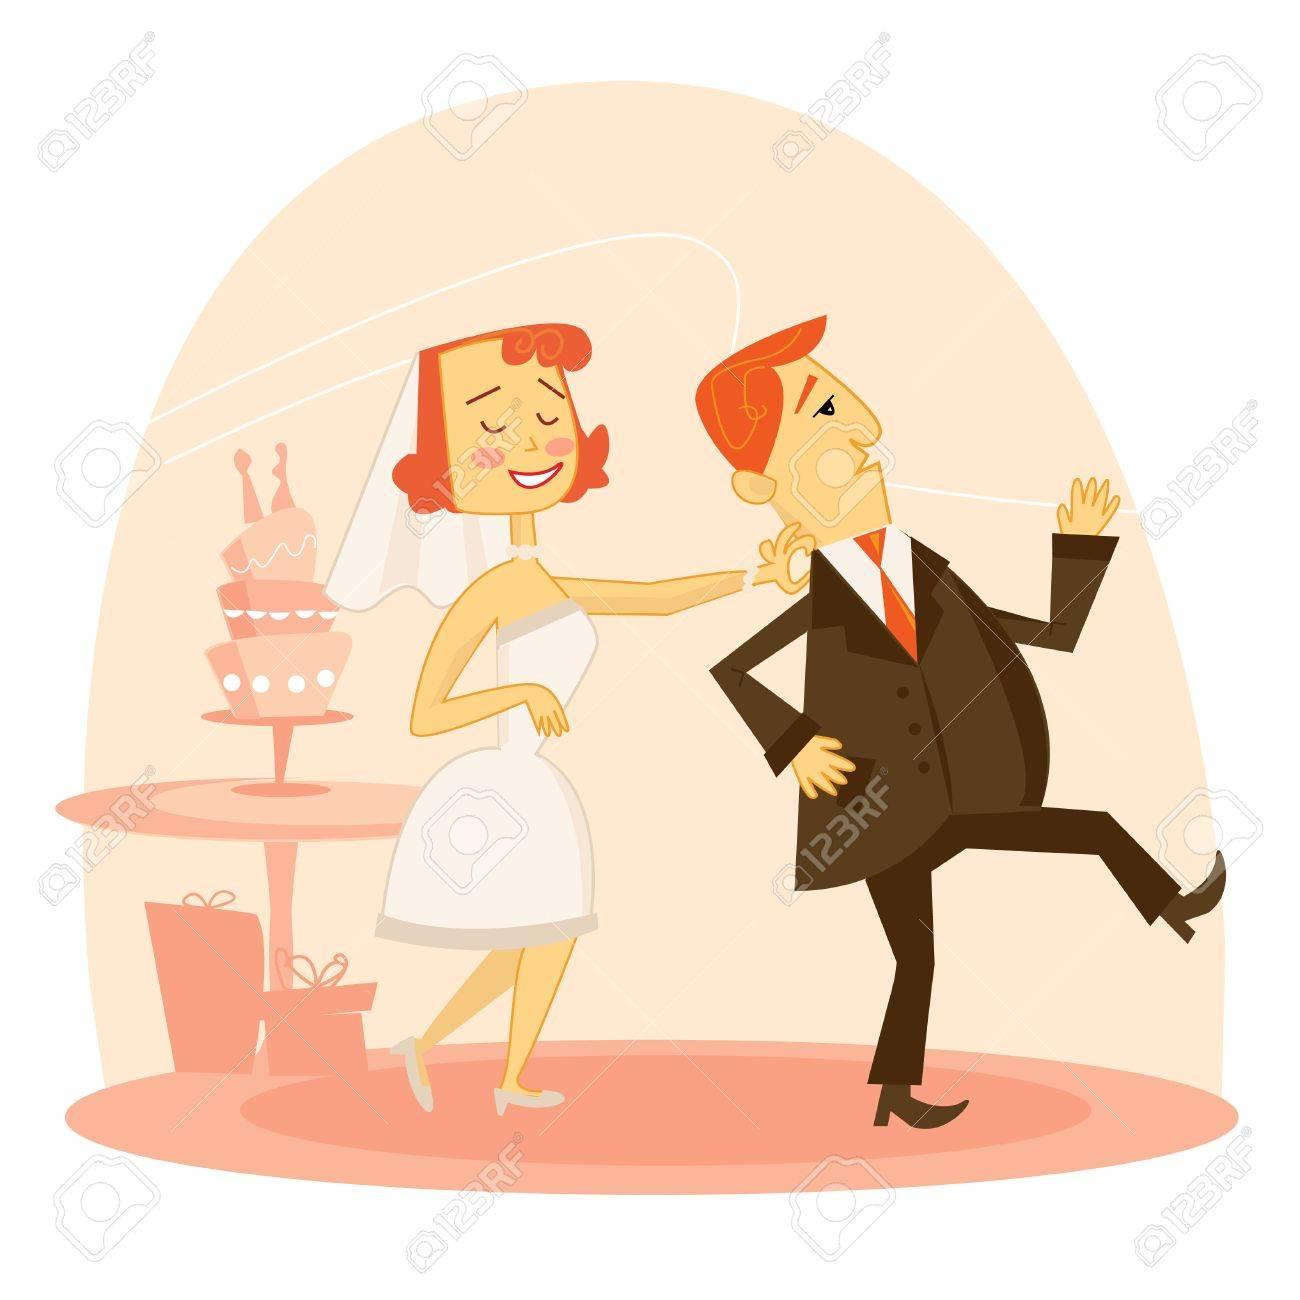 Cartoon wedding couple - 6294205